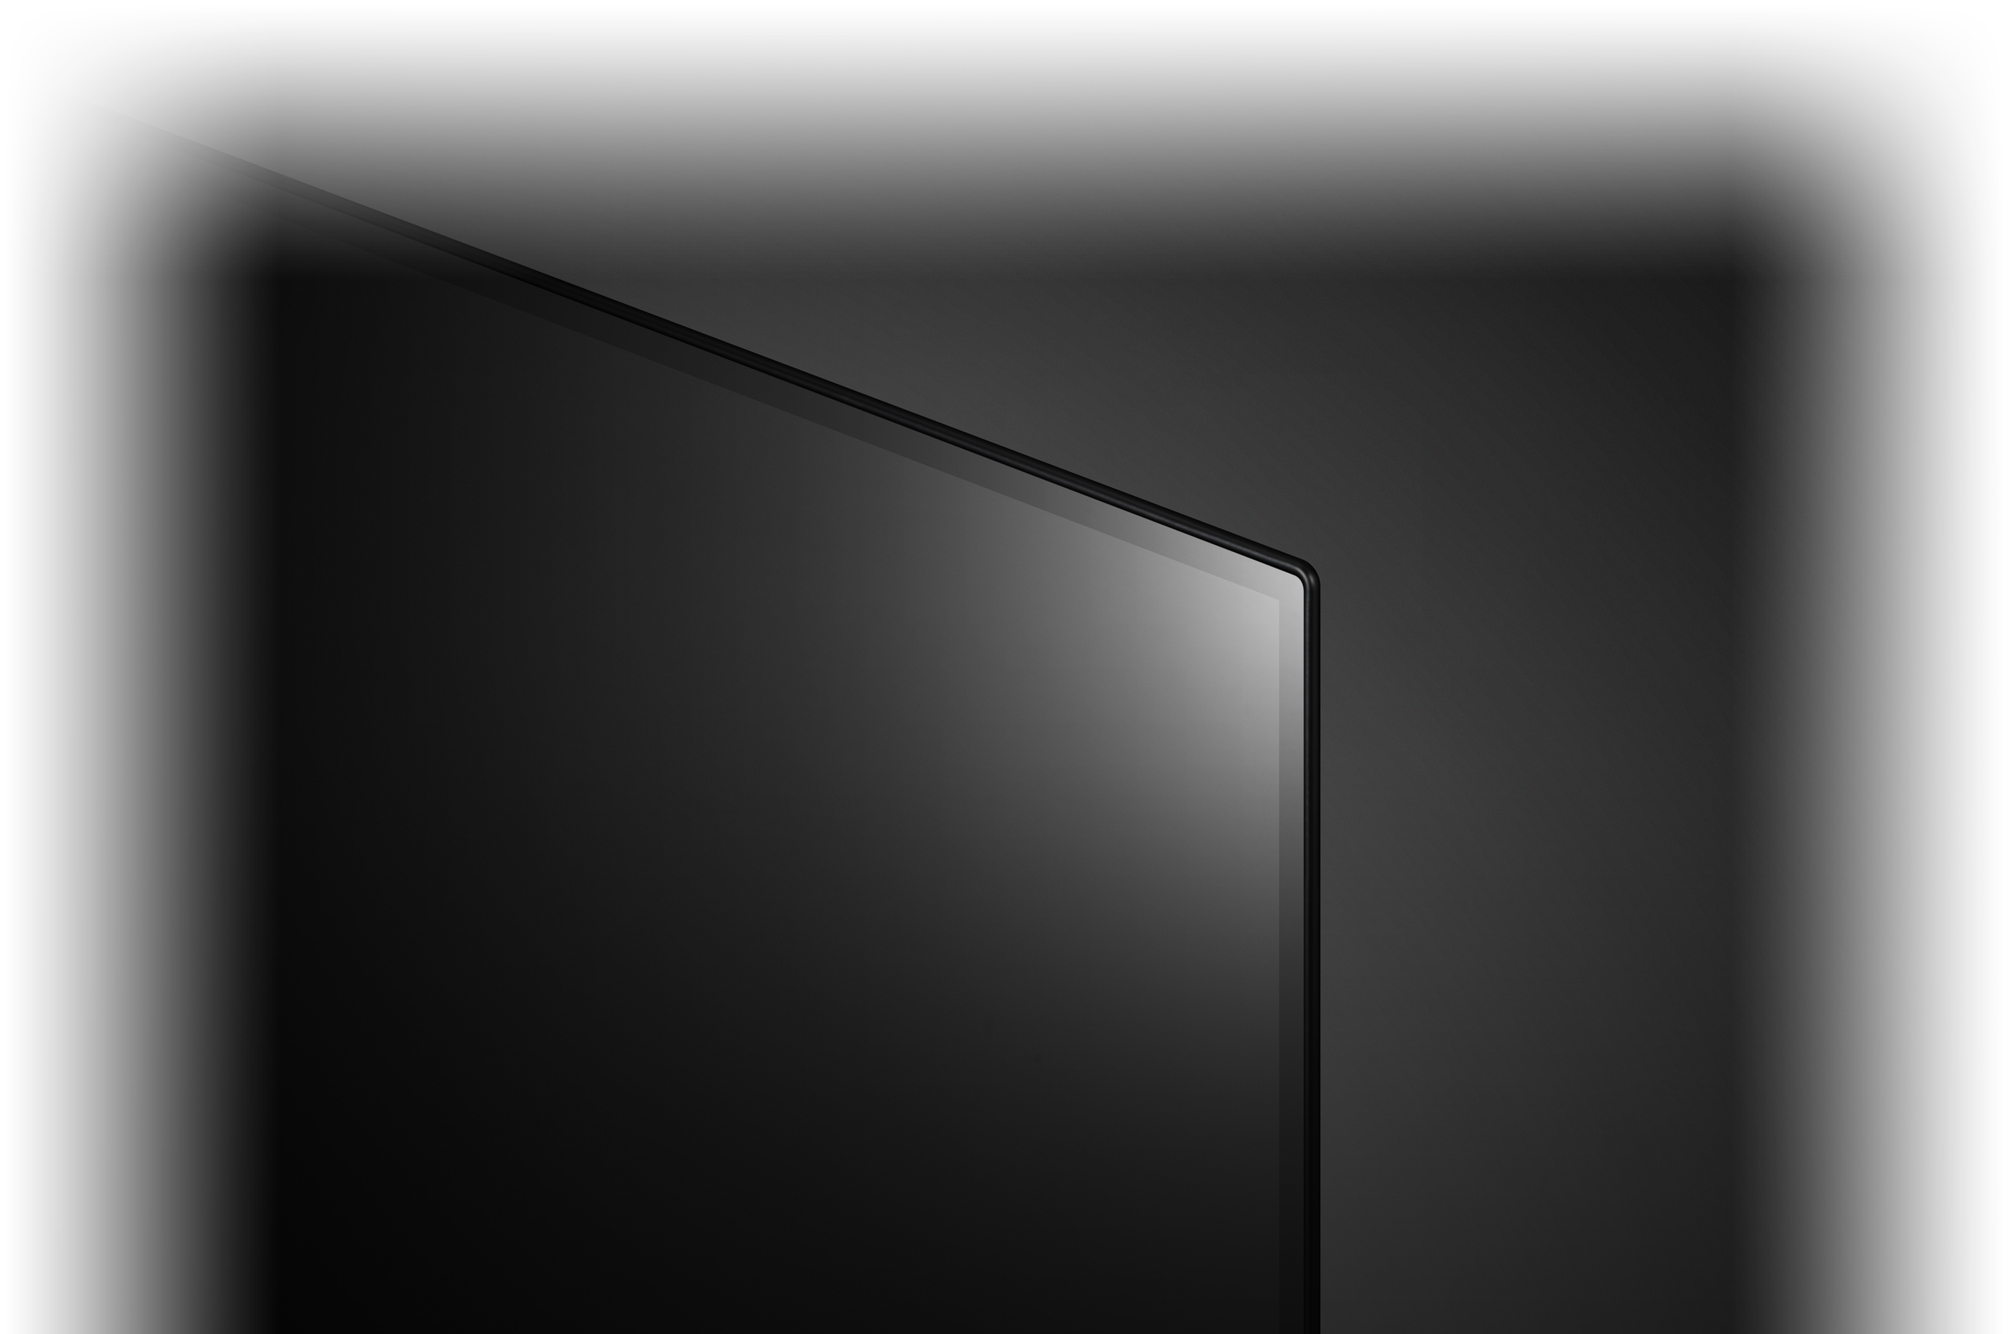 LG Pro:Centric SMART 65ET960H (NA) 11